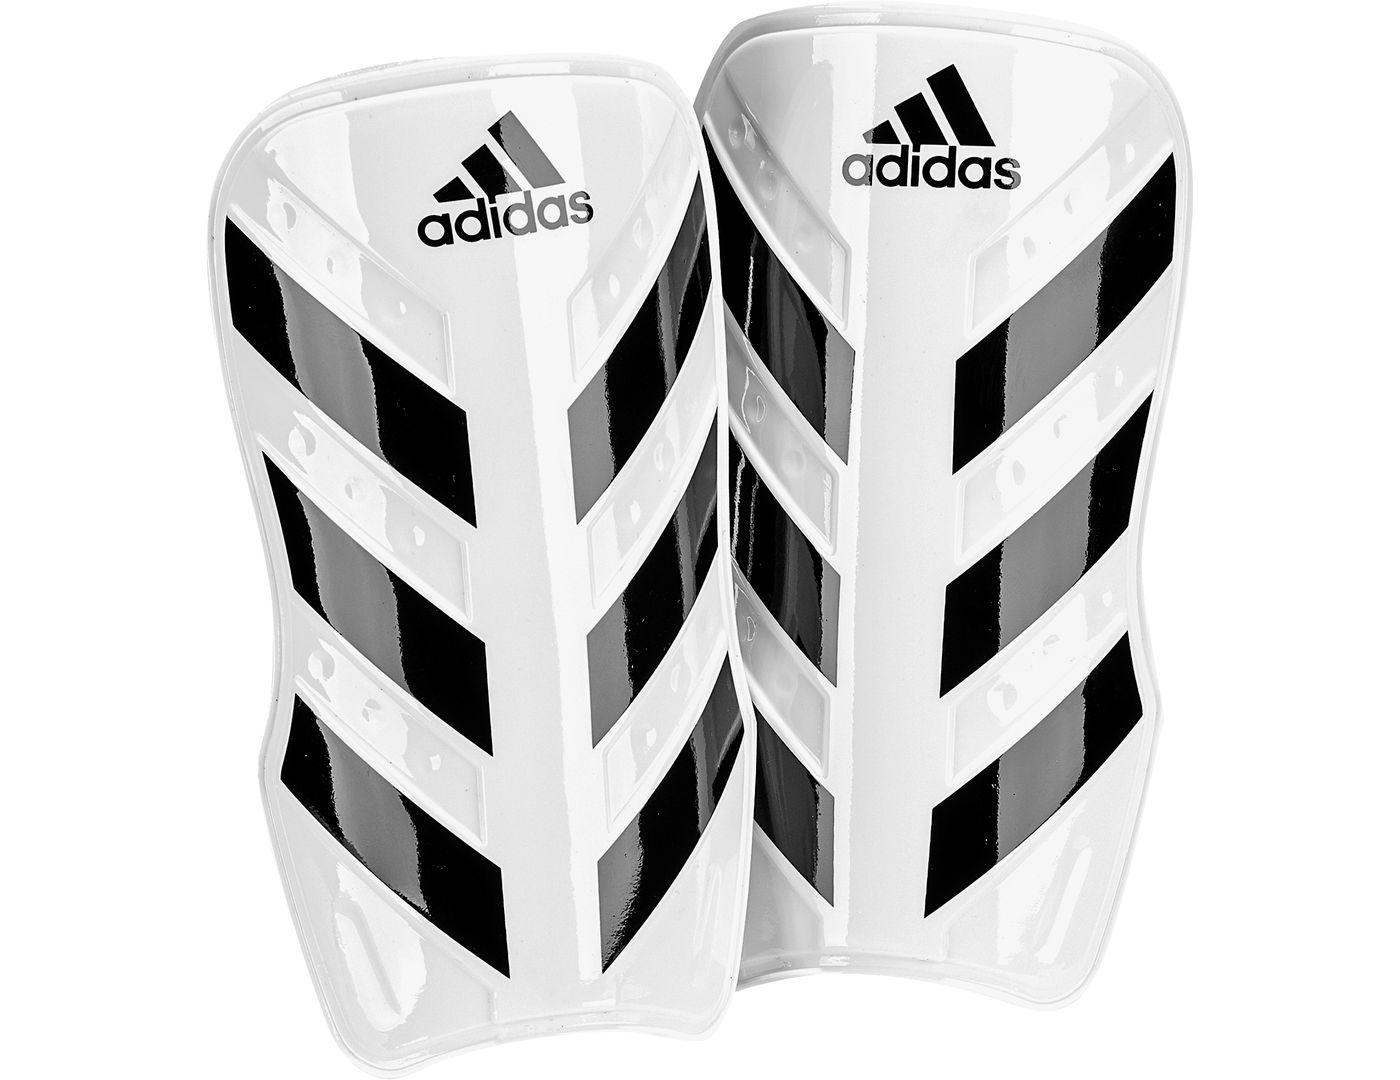 adidas Adult Ever Lesto Soccer Shin Guards